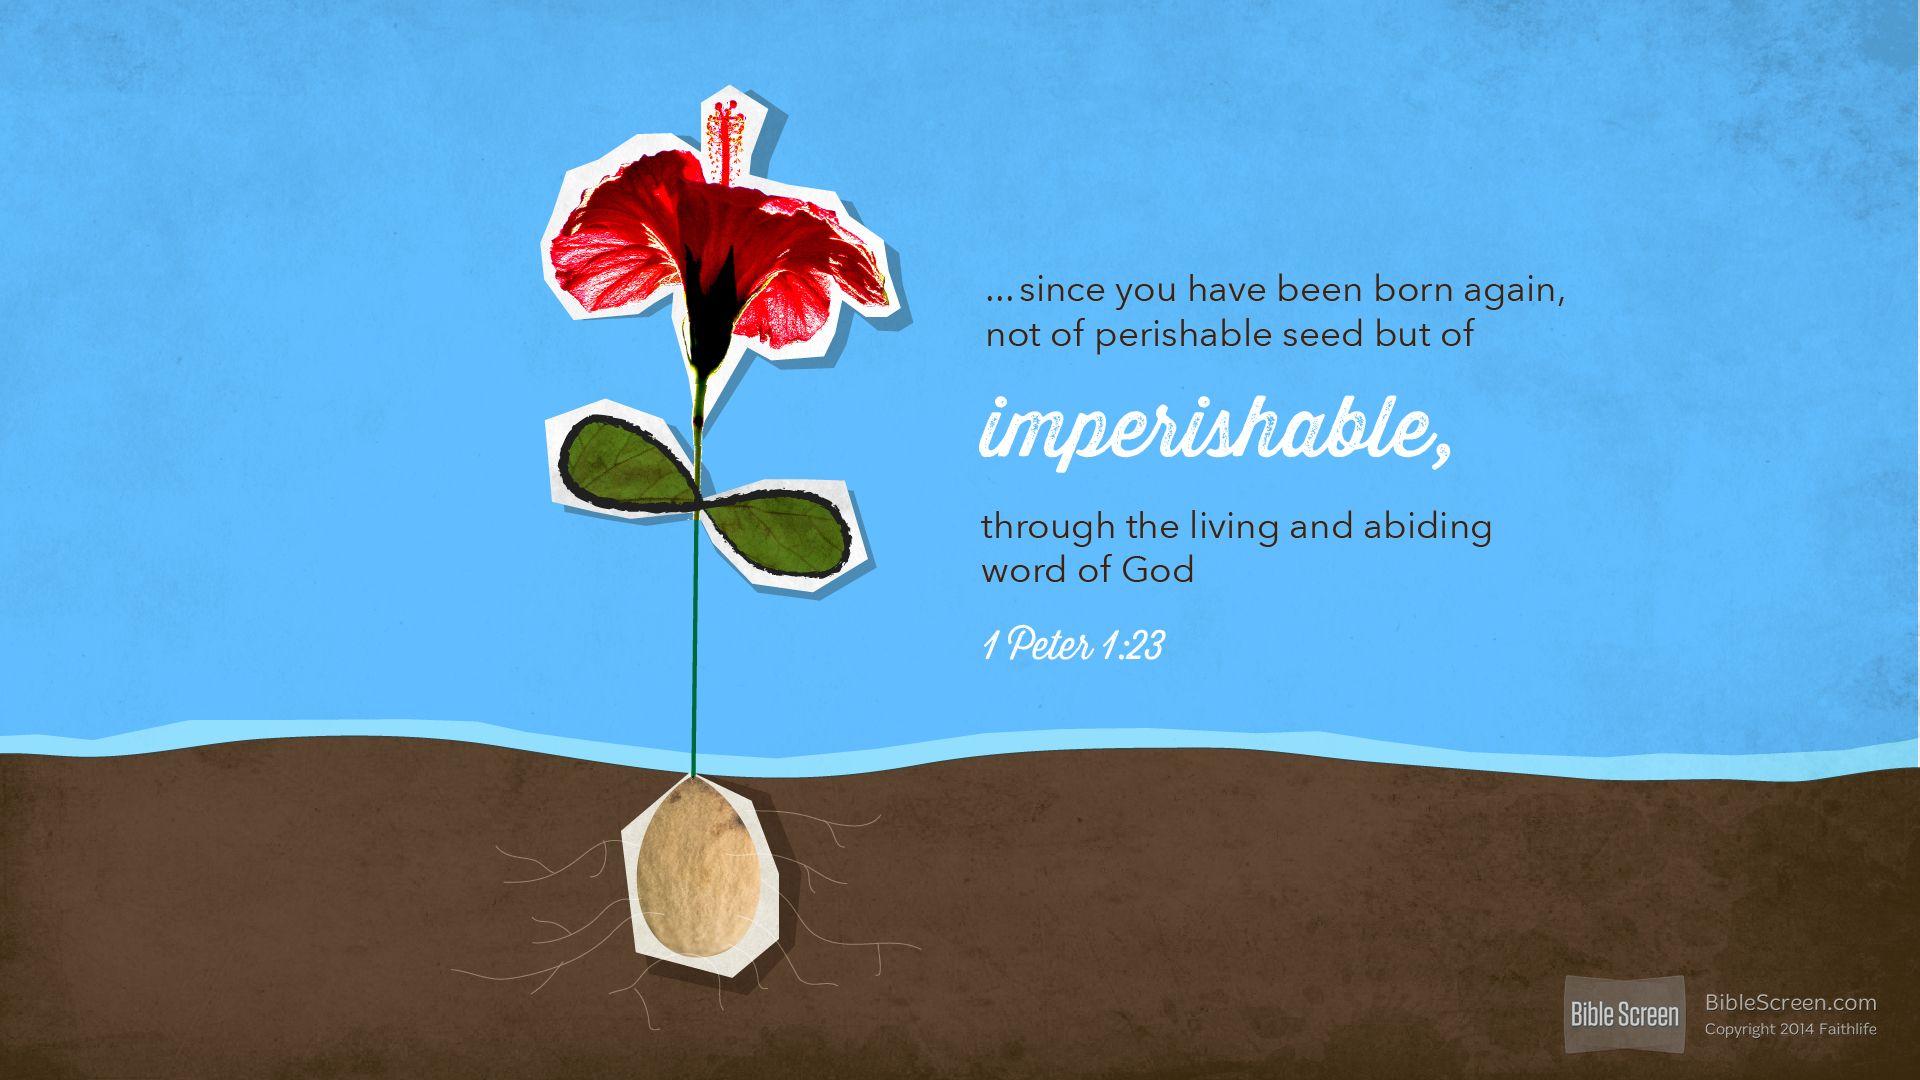 I'm reading 1 Peter 1:23